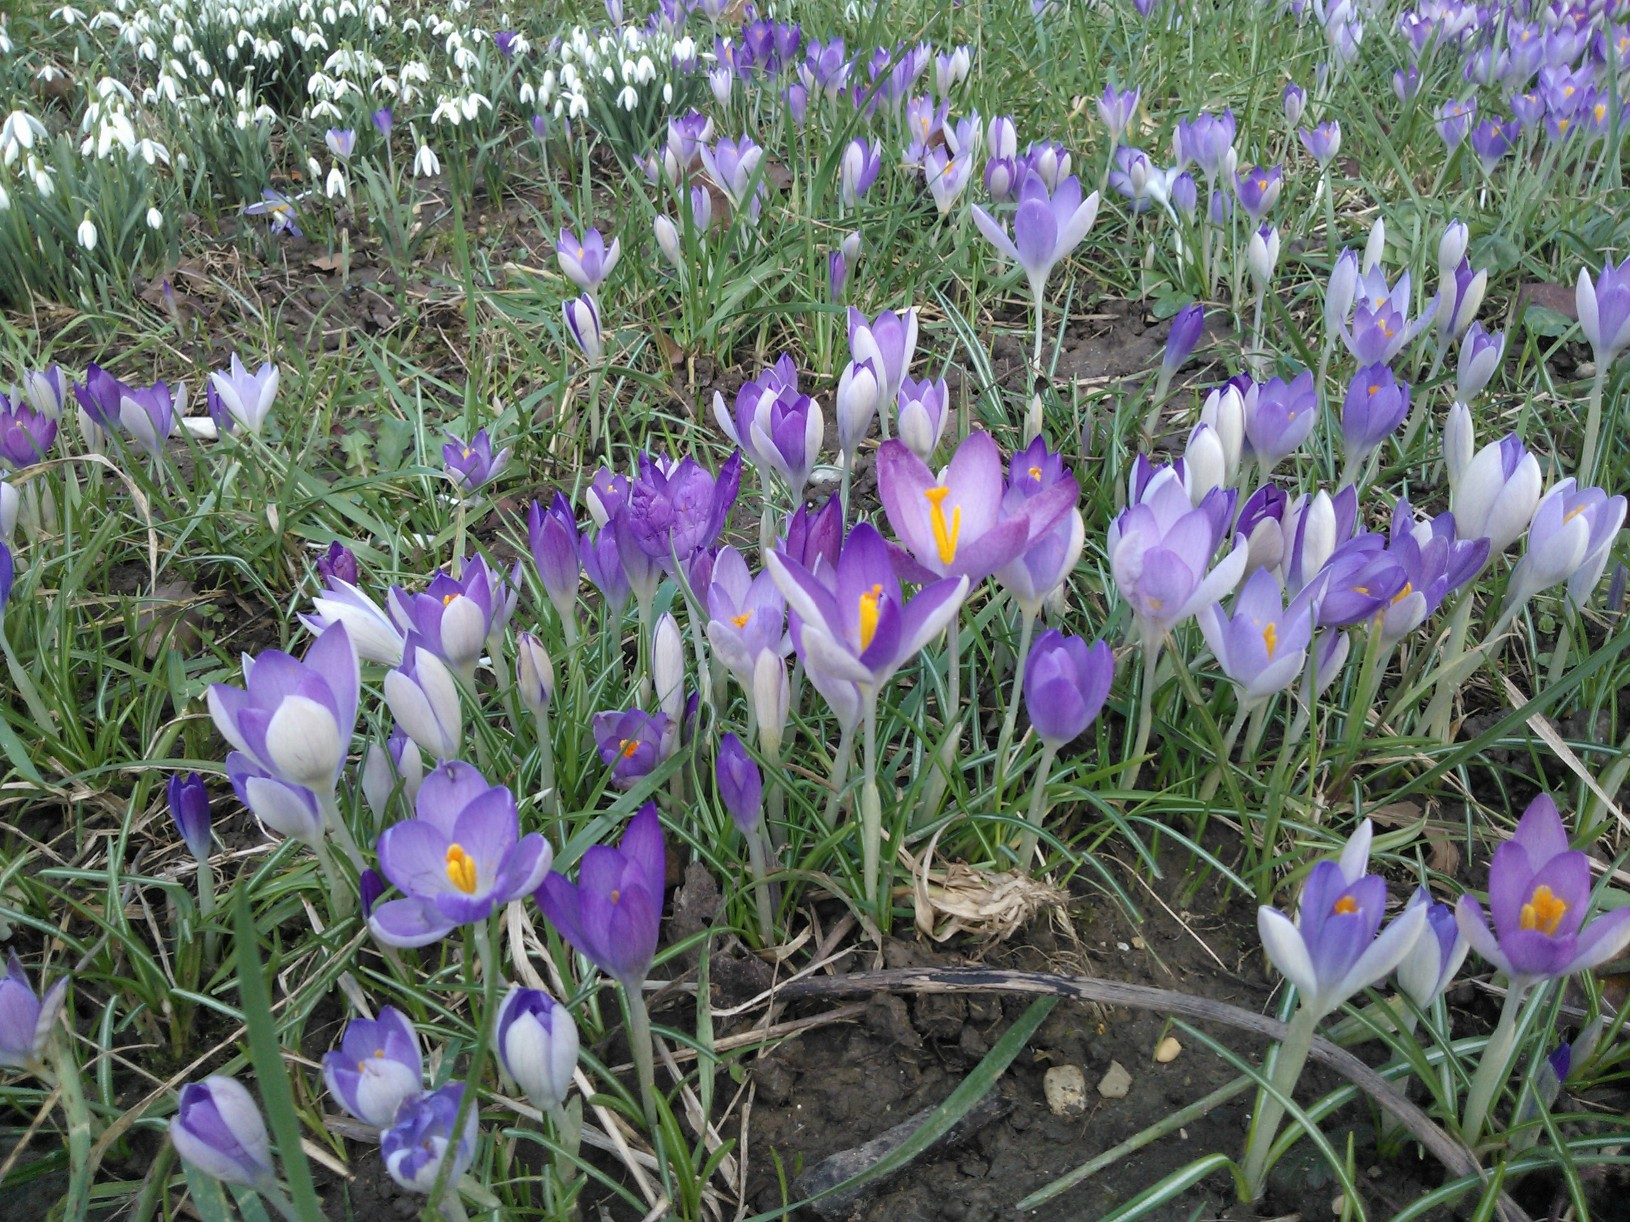 Kevät kukkii